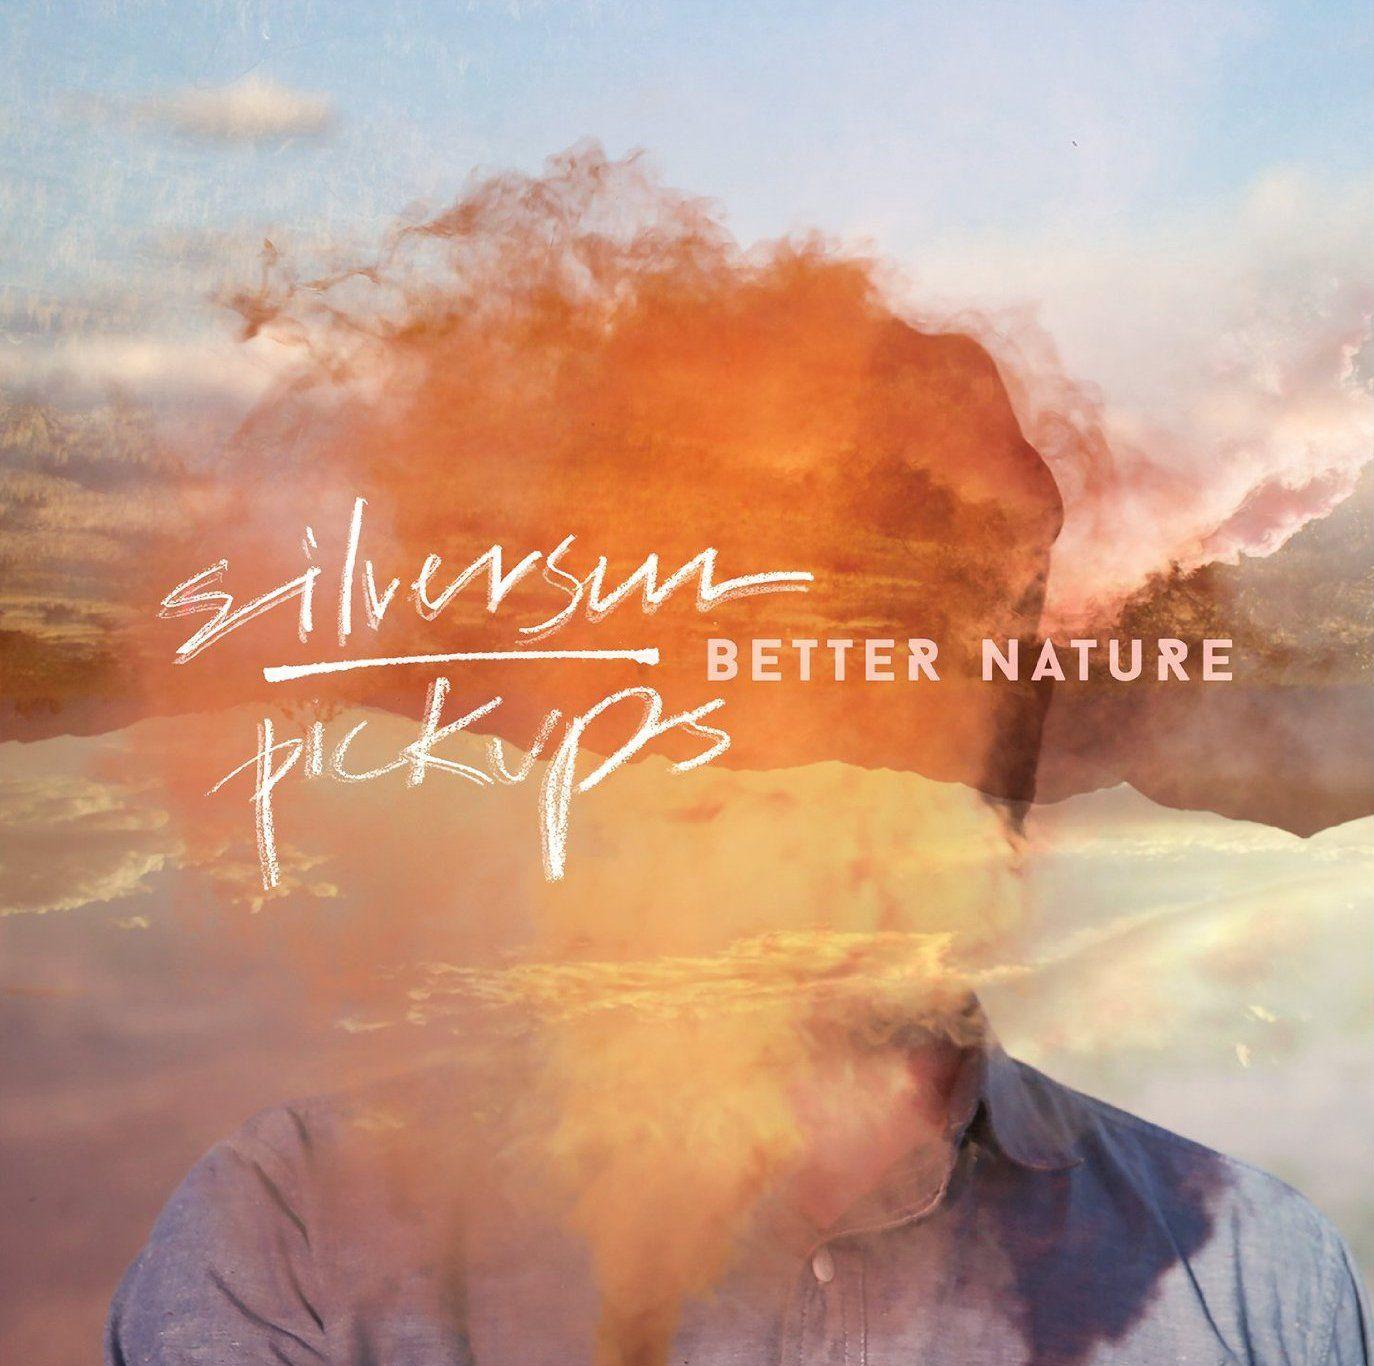 Silversun Pickups Better Nature Music Silversun Pickups Amazing Nature Music Artwork